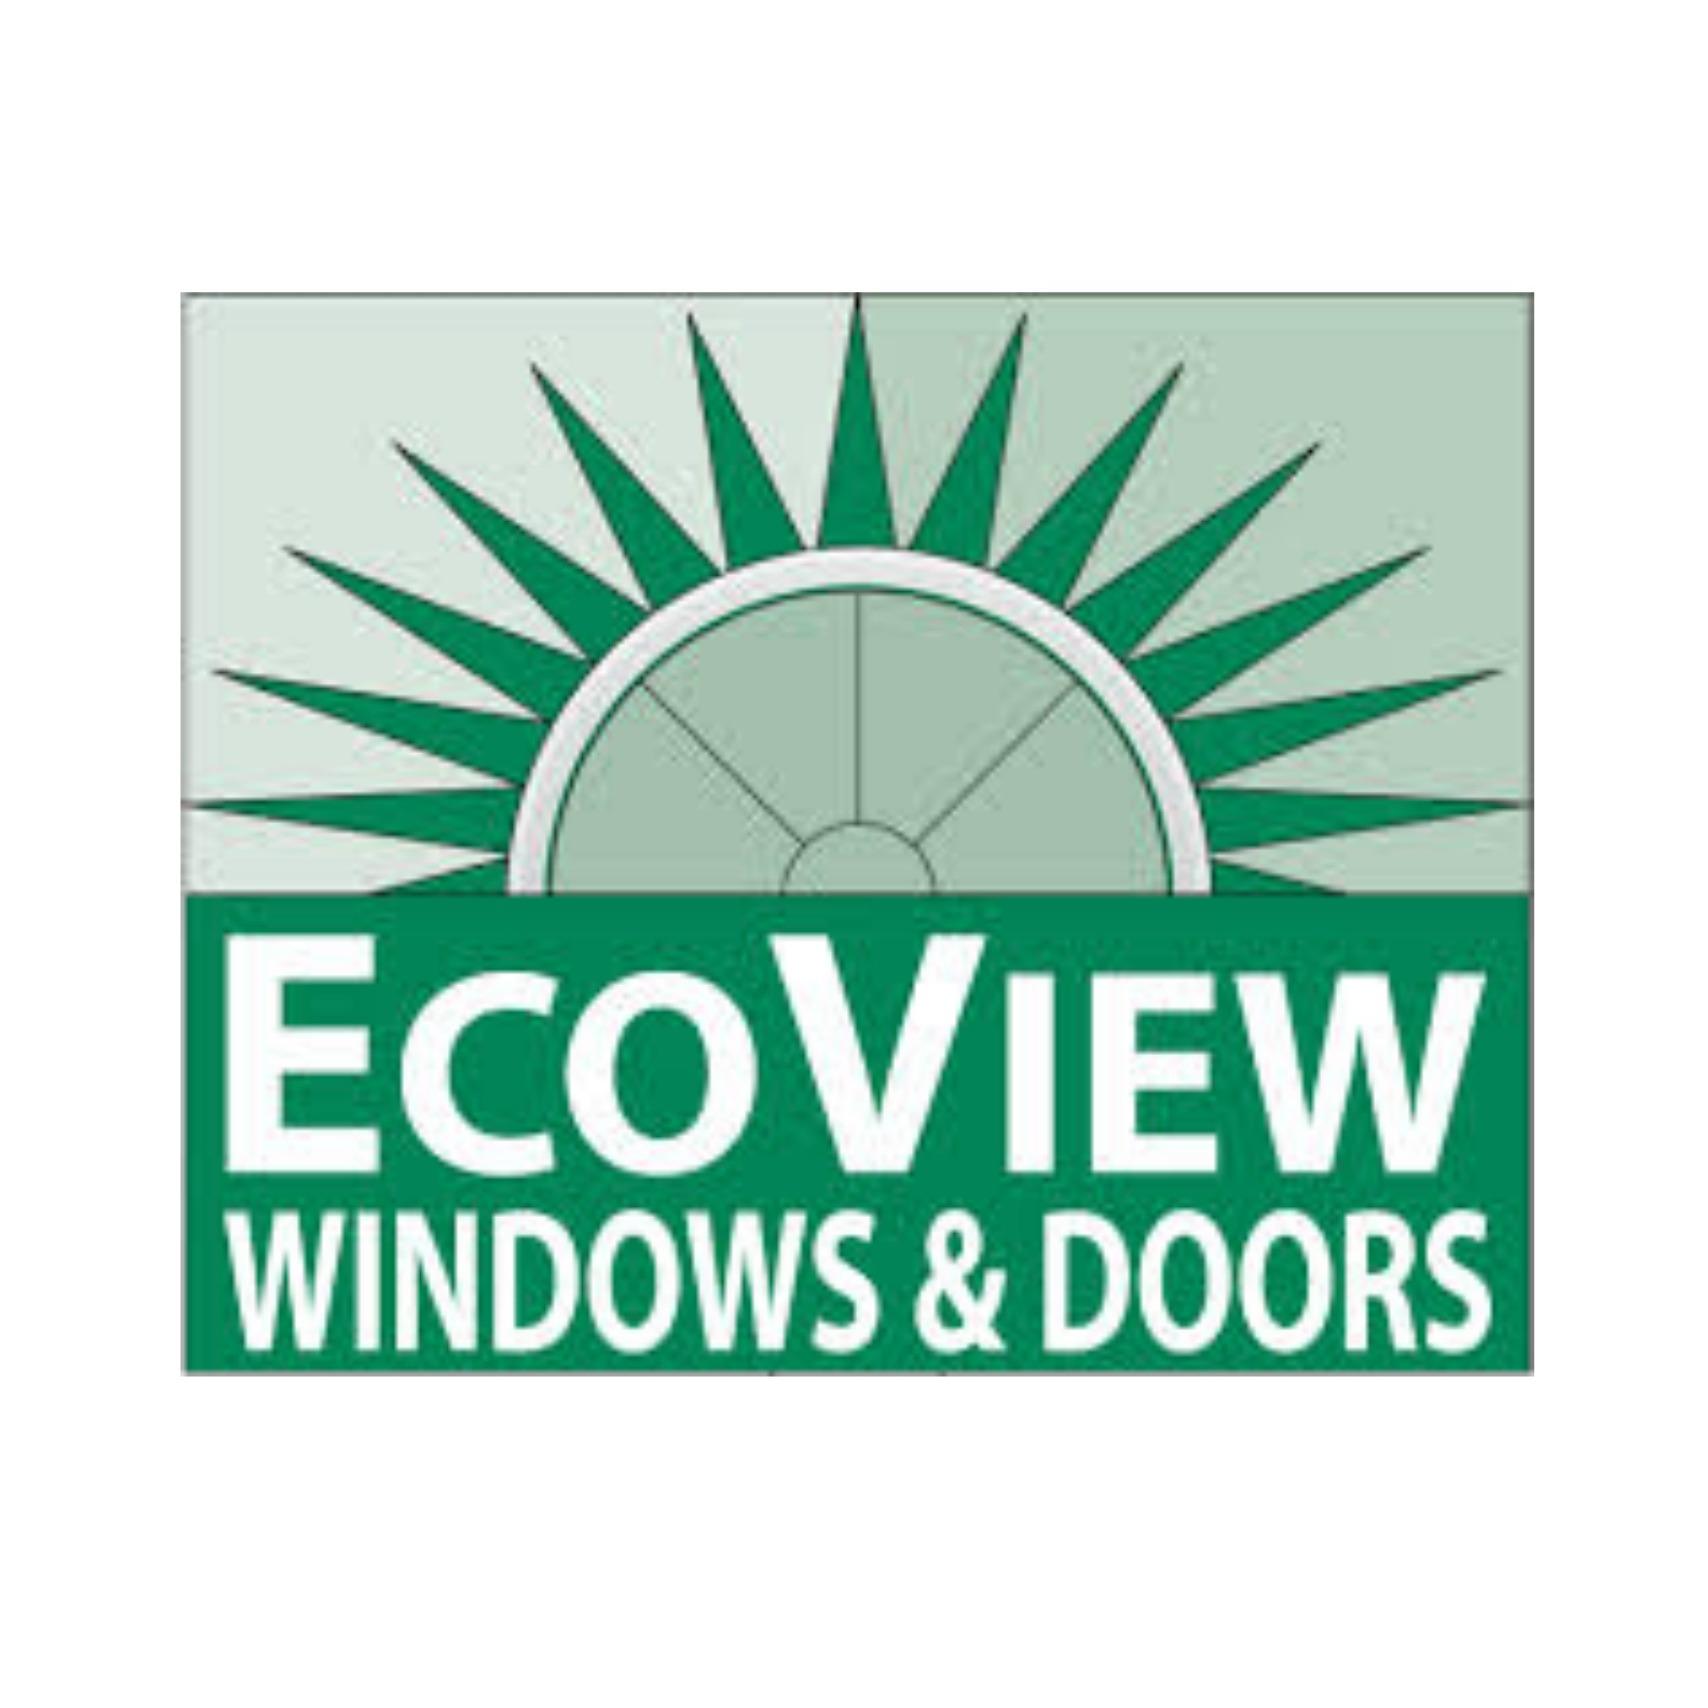 Ecoview Windows & Doors